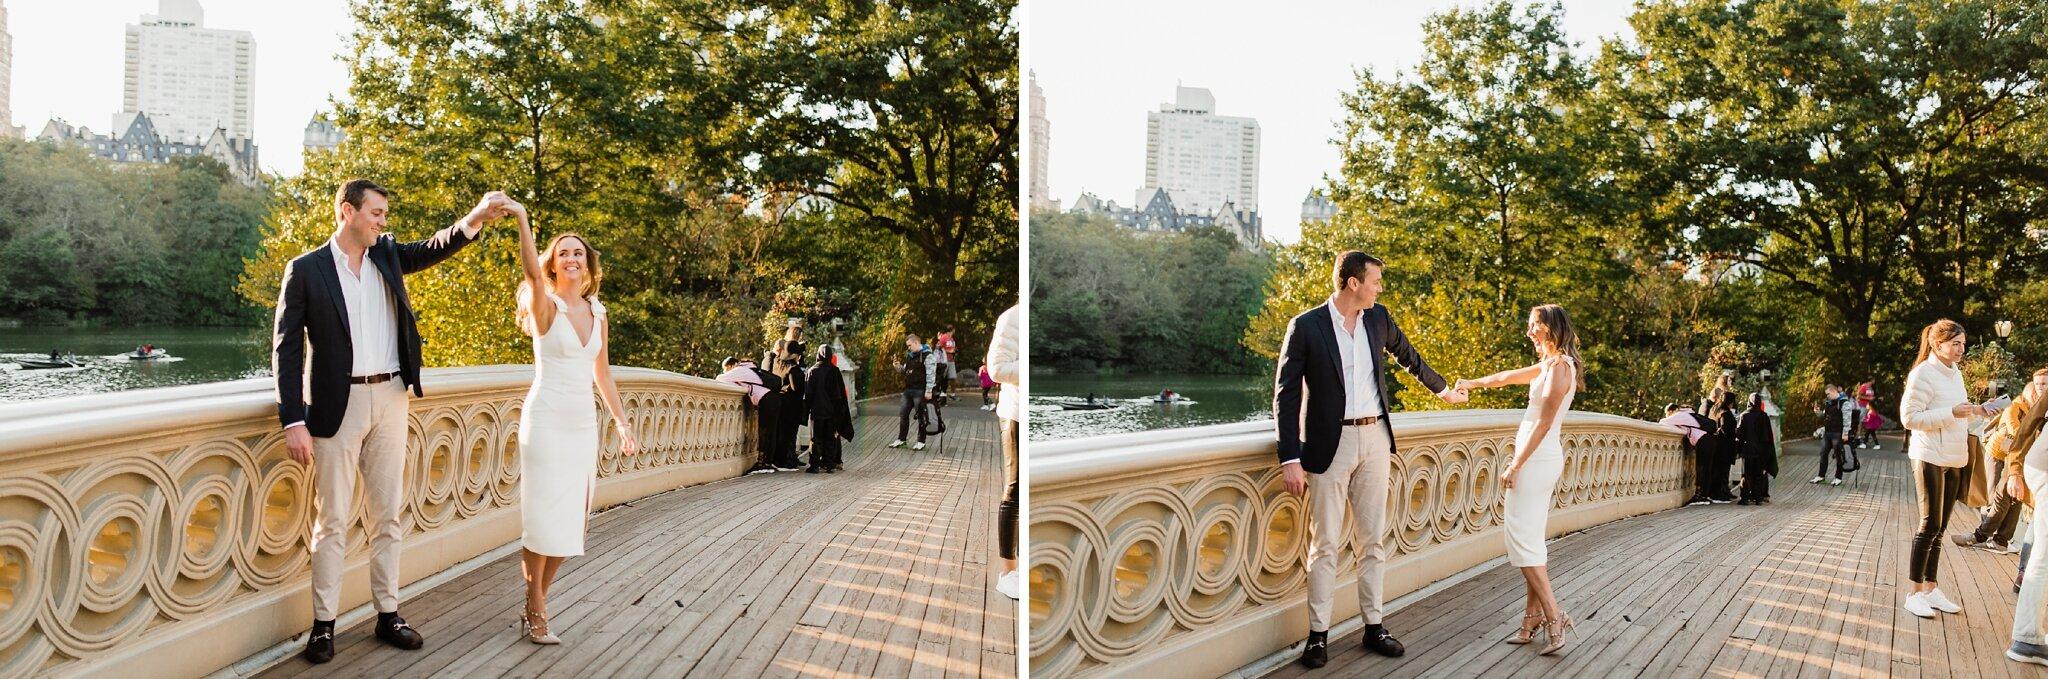 Alicia+lucia+photography+-+albuquerque+wedding+photographer+-+santa+fe+wedding+photography+-+new+mexico+wedding+photographer+-+new+mexico+wedding+-+engagement+-+new+york+engagement+-+new+york+city+engagement+-+central+park+engagement_0006.jpg